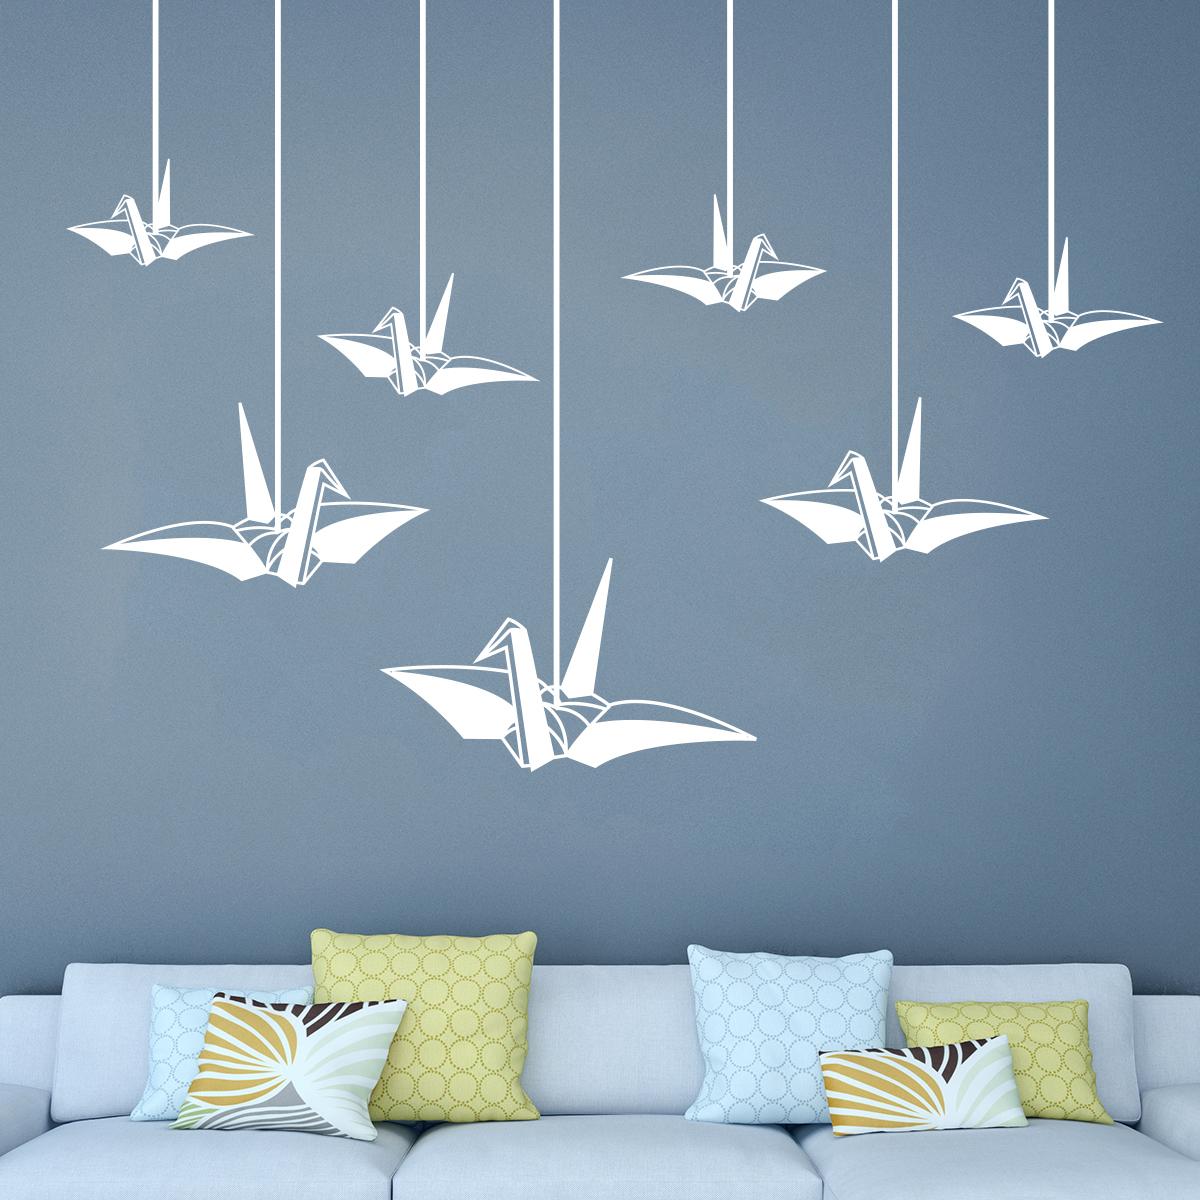 sticker origami 7 cygnes volants stickers animaux oiseaux ambiance sticker. Black Bedroom Furniture Sets. Home Design Ideas